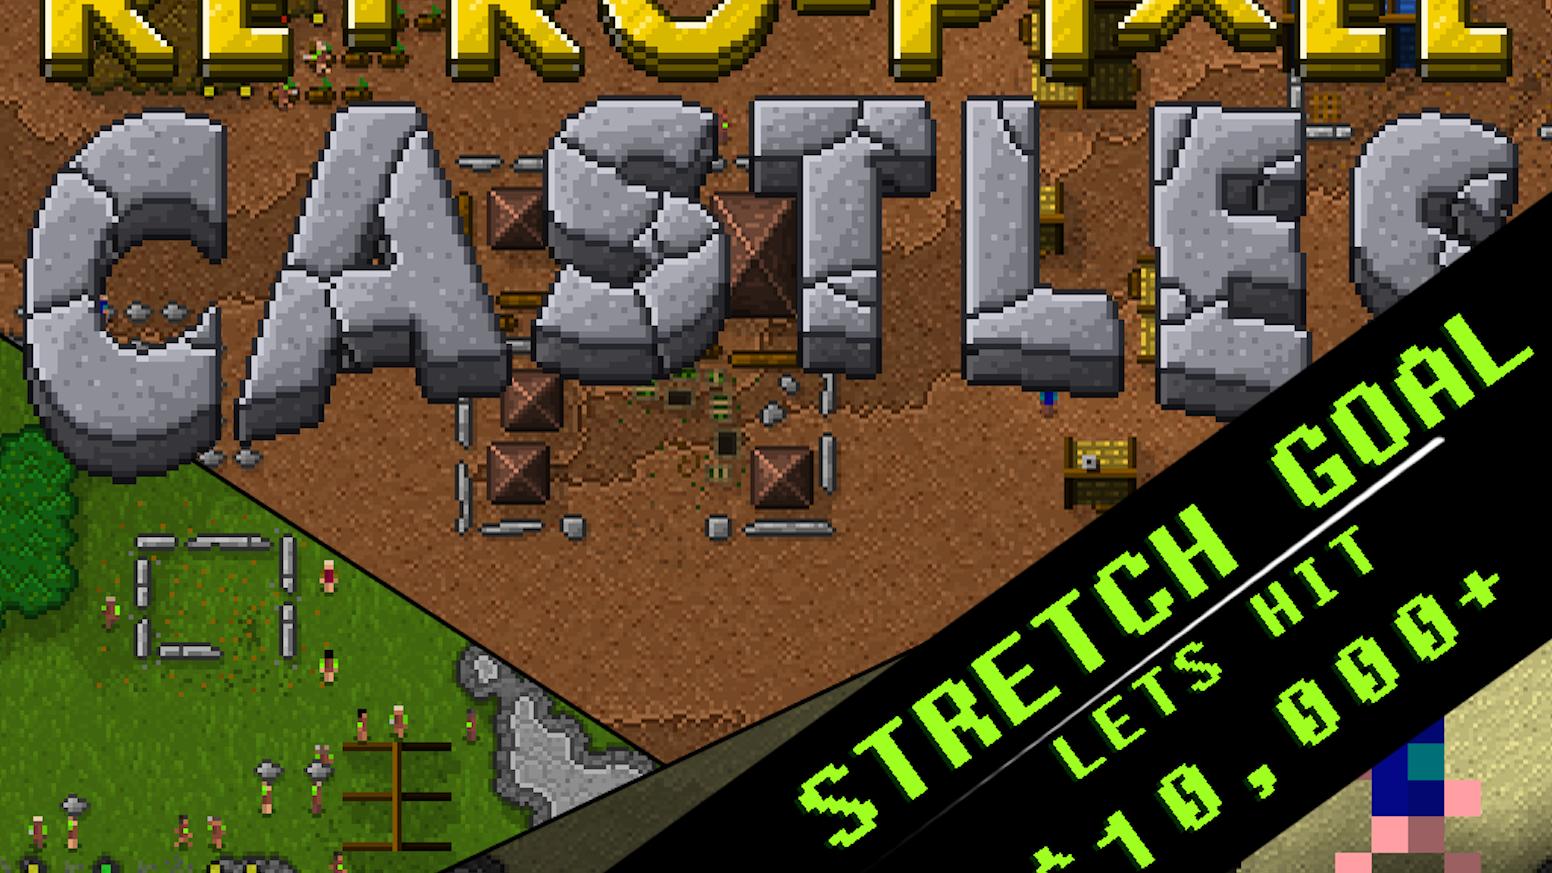 Retro-Pixel Castles - Village Survival Mayhem! by Raymond Doerr